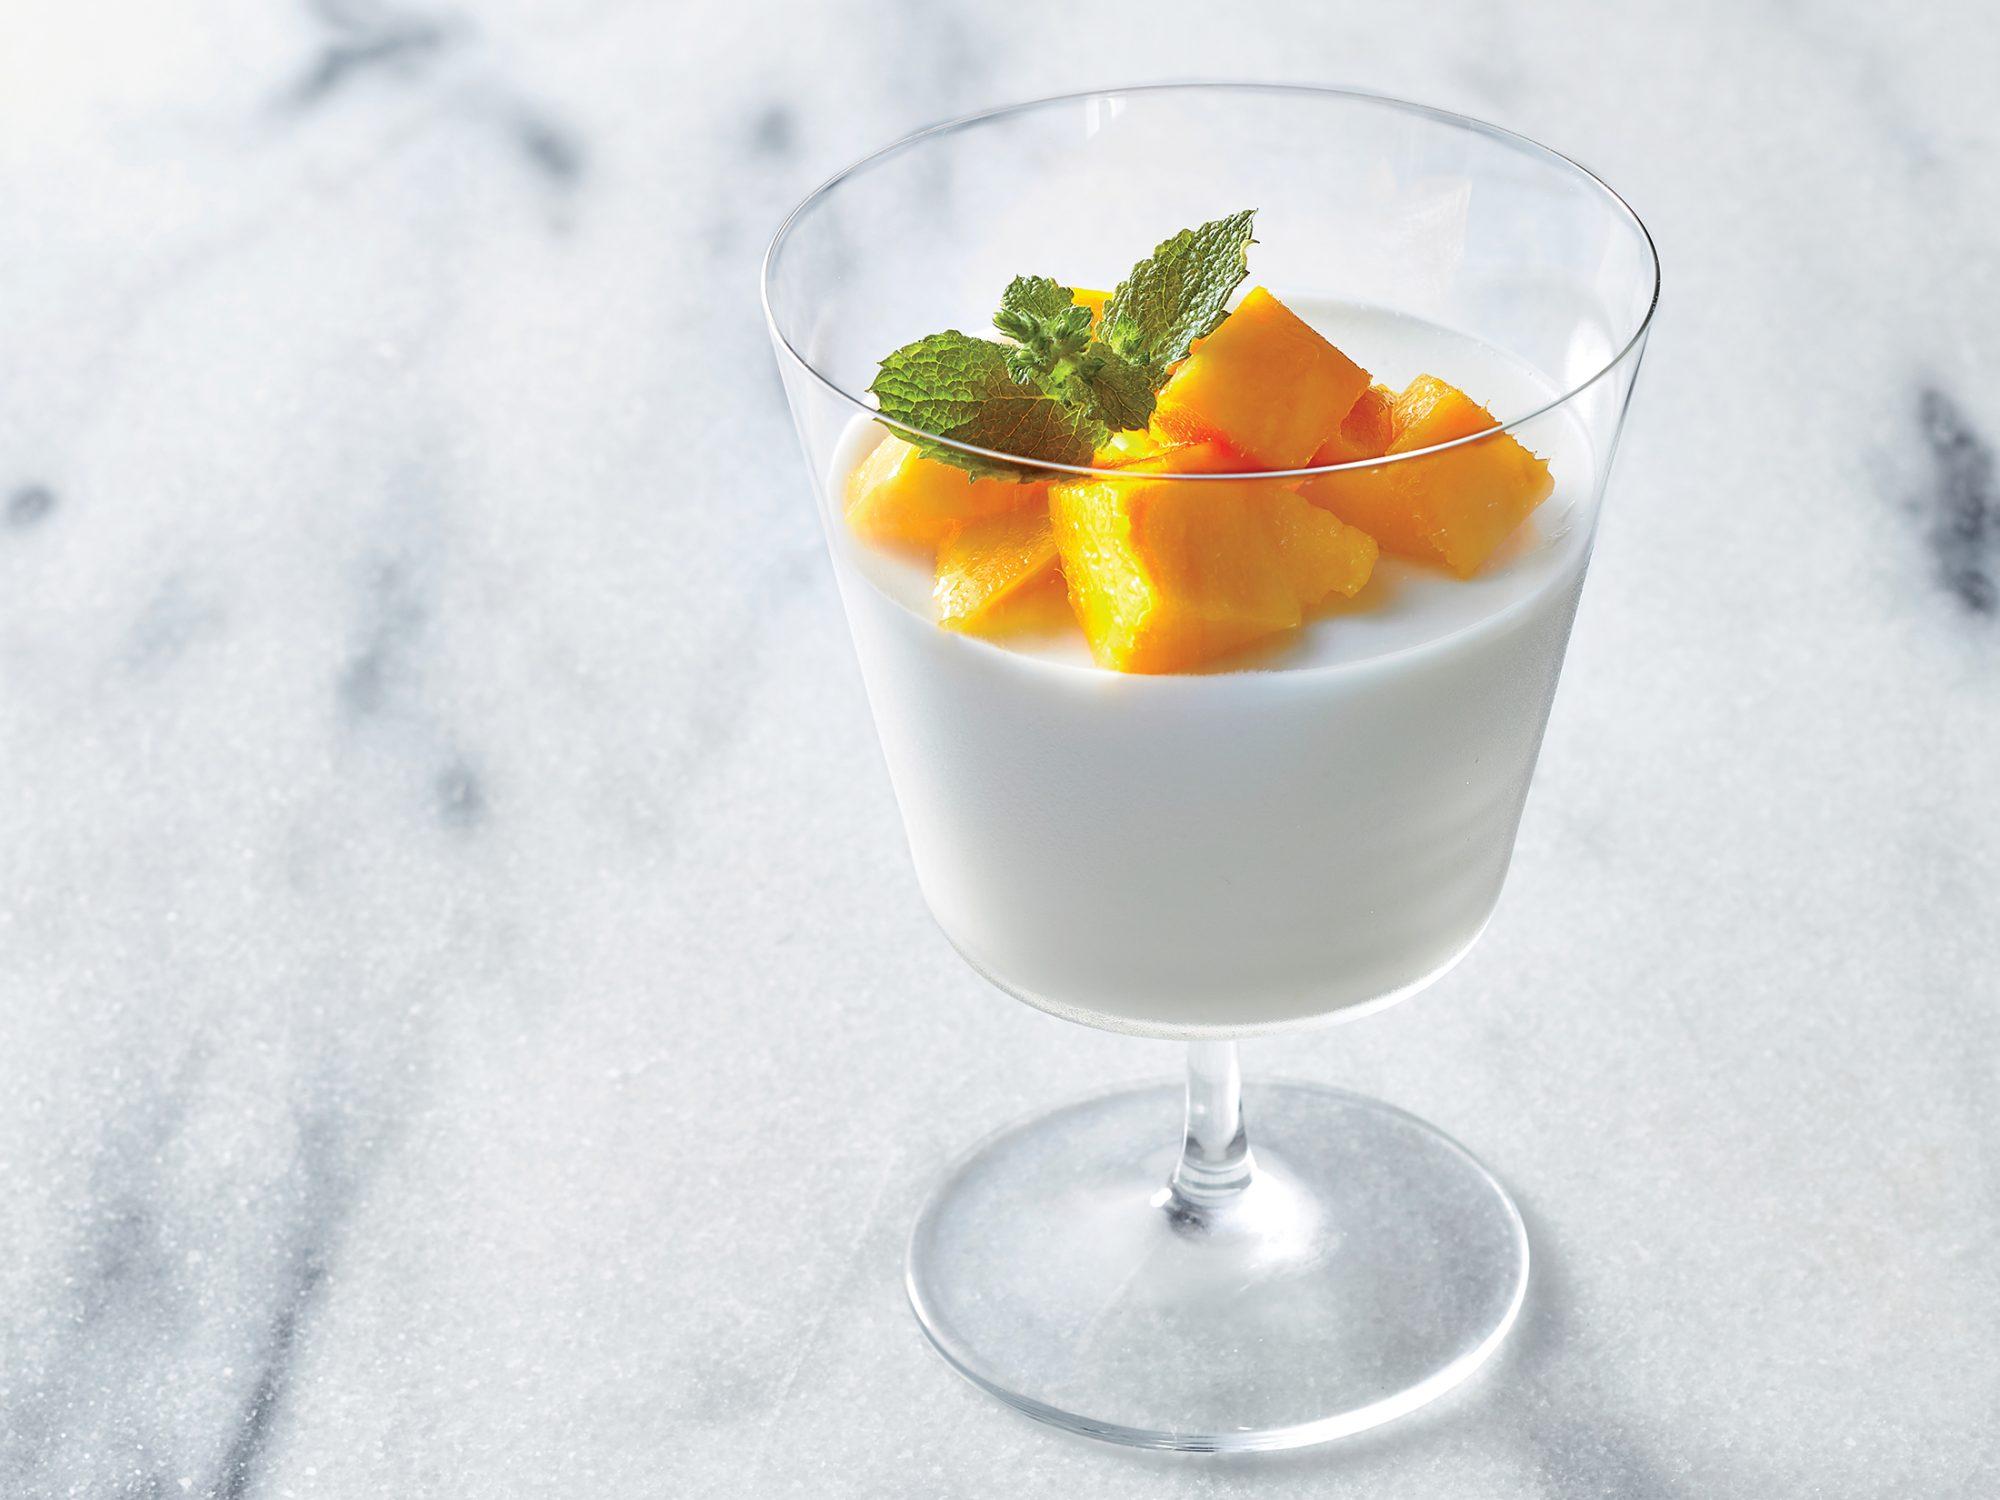 Coconut Milk Panna Cotta